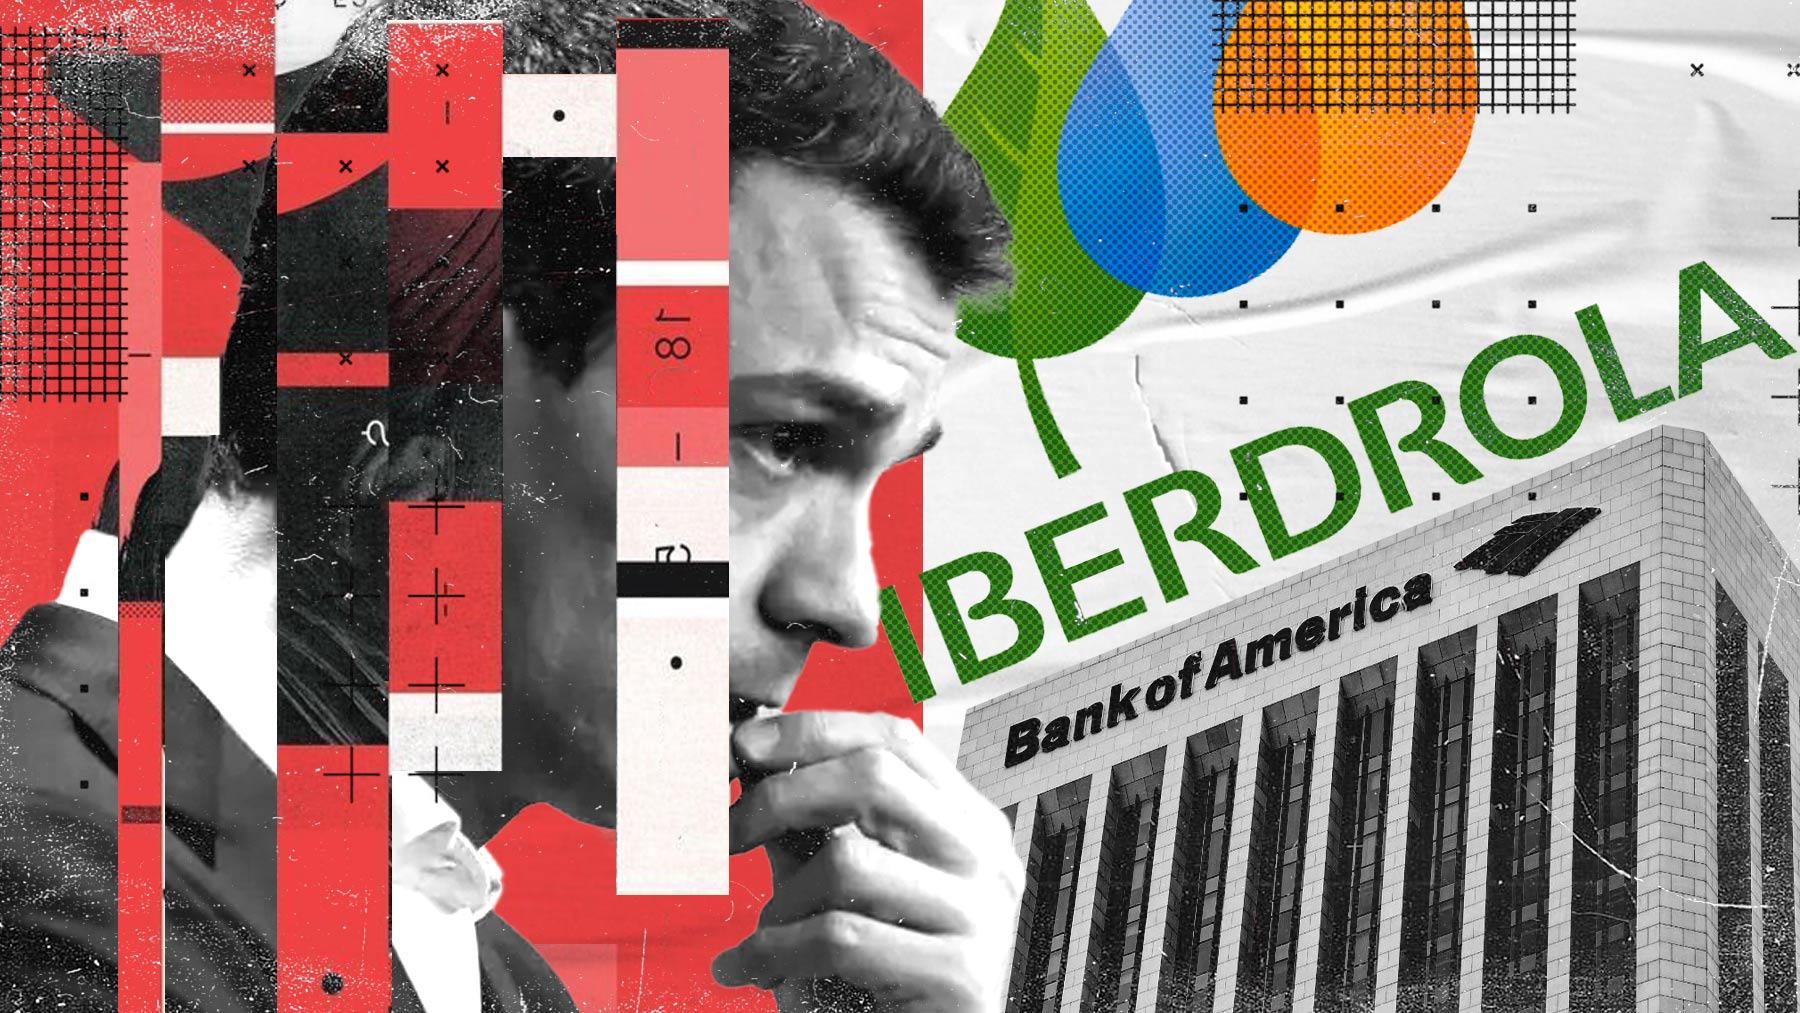 Recomendación de Bank of America sobre Iberdrola.